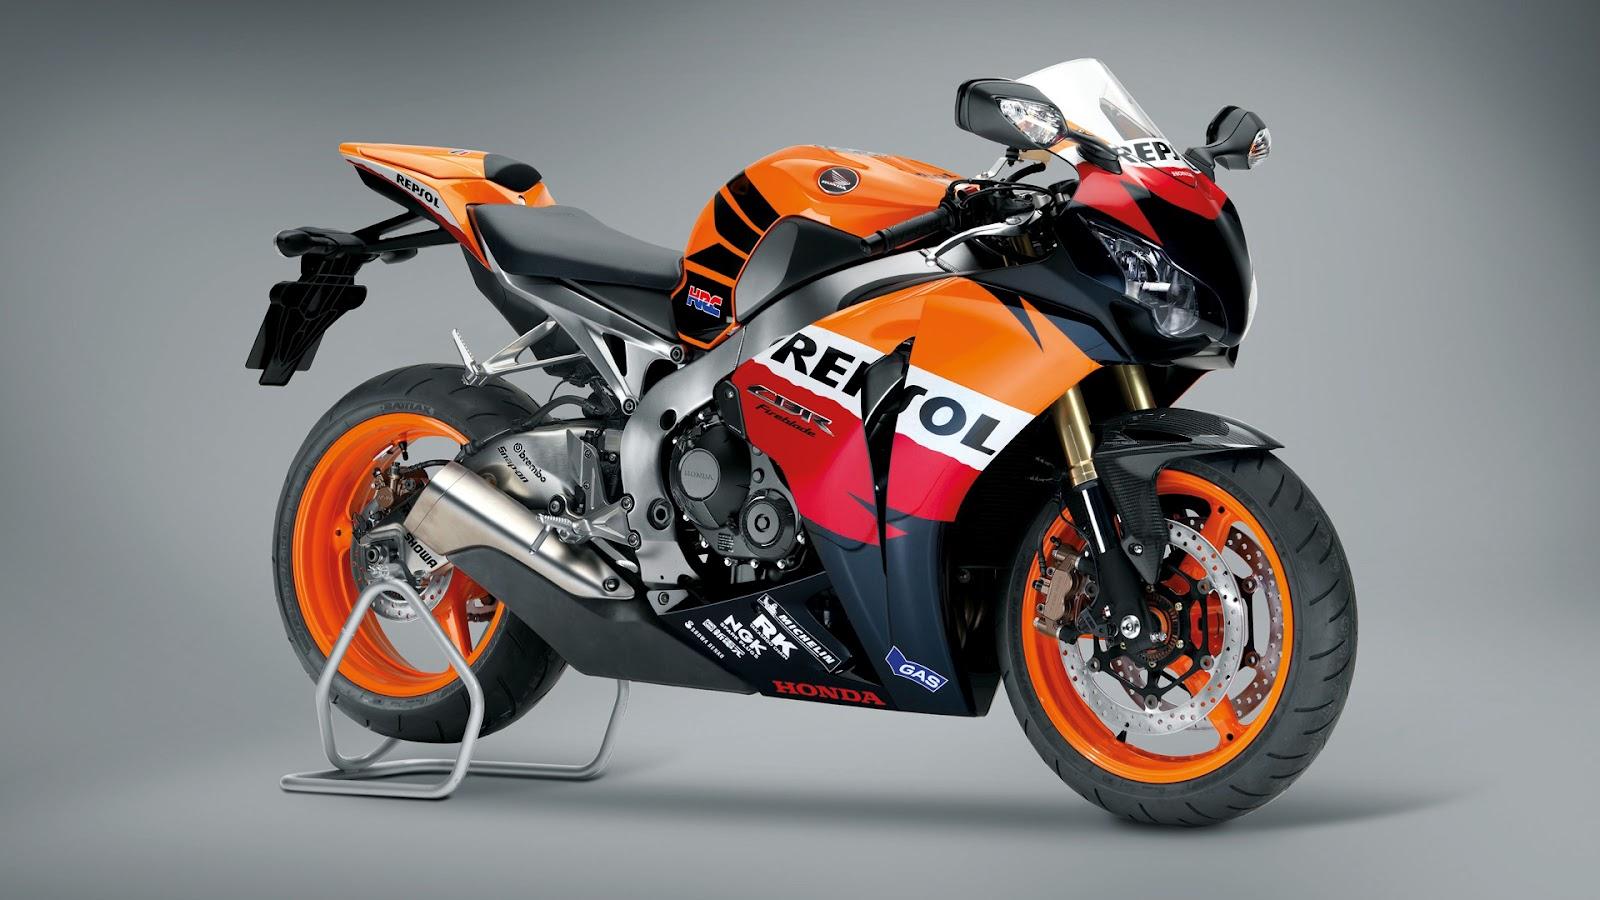 http://1.bp.blogspot.com/-XZDfWJIcNx4/T8xOKRWMuaI/AAAAAAAABHQ/Febh24XnLcY/s1600/Honda-Repsol-HD-Wallpapers.jpg